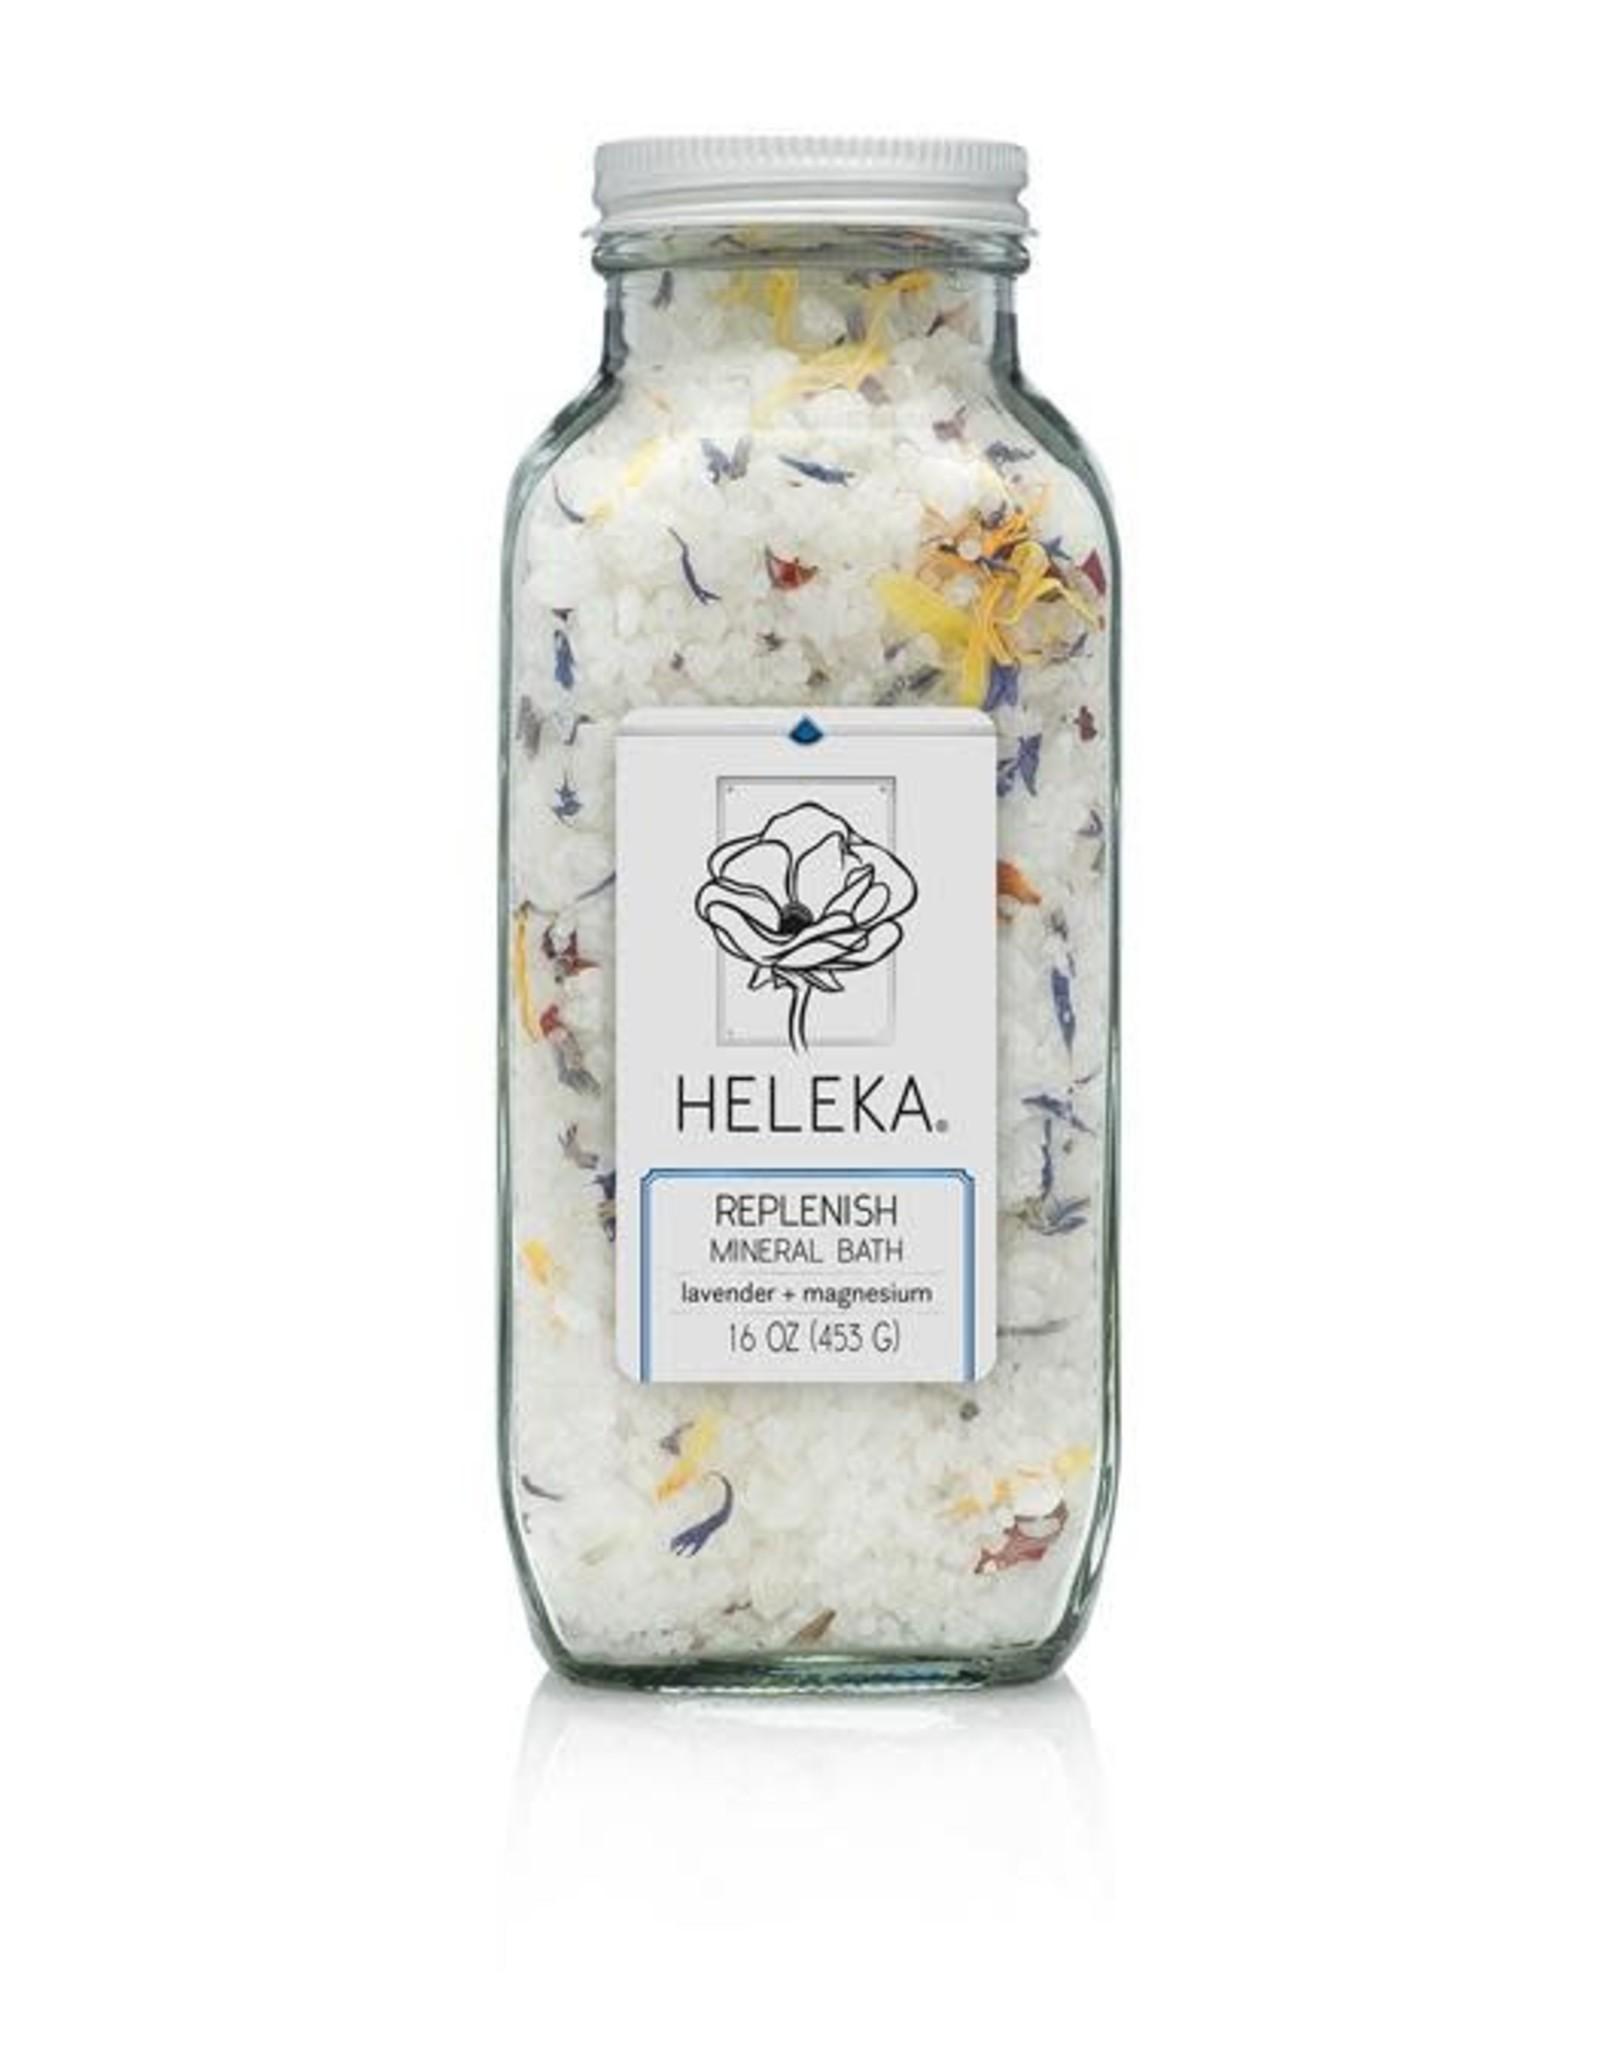 Heleka Replenish Mineral Bath